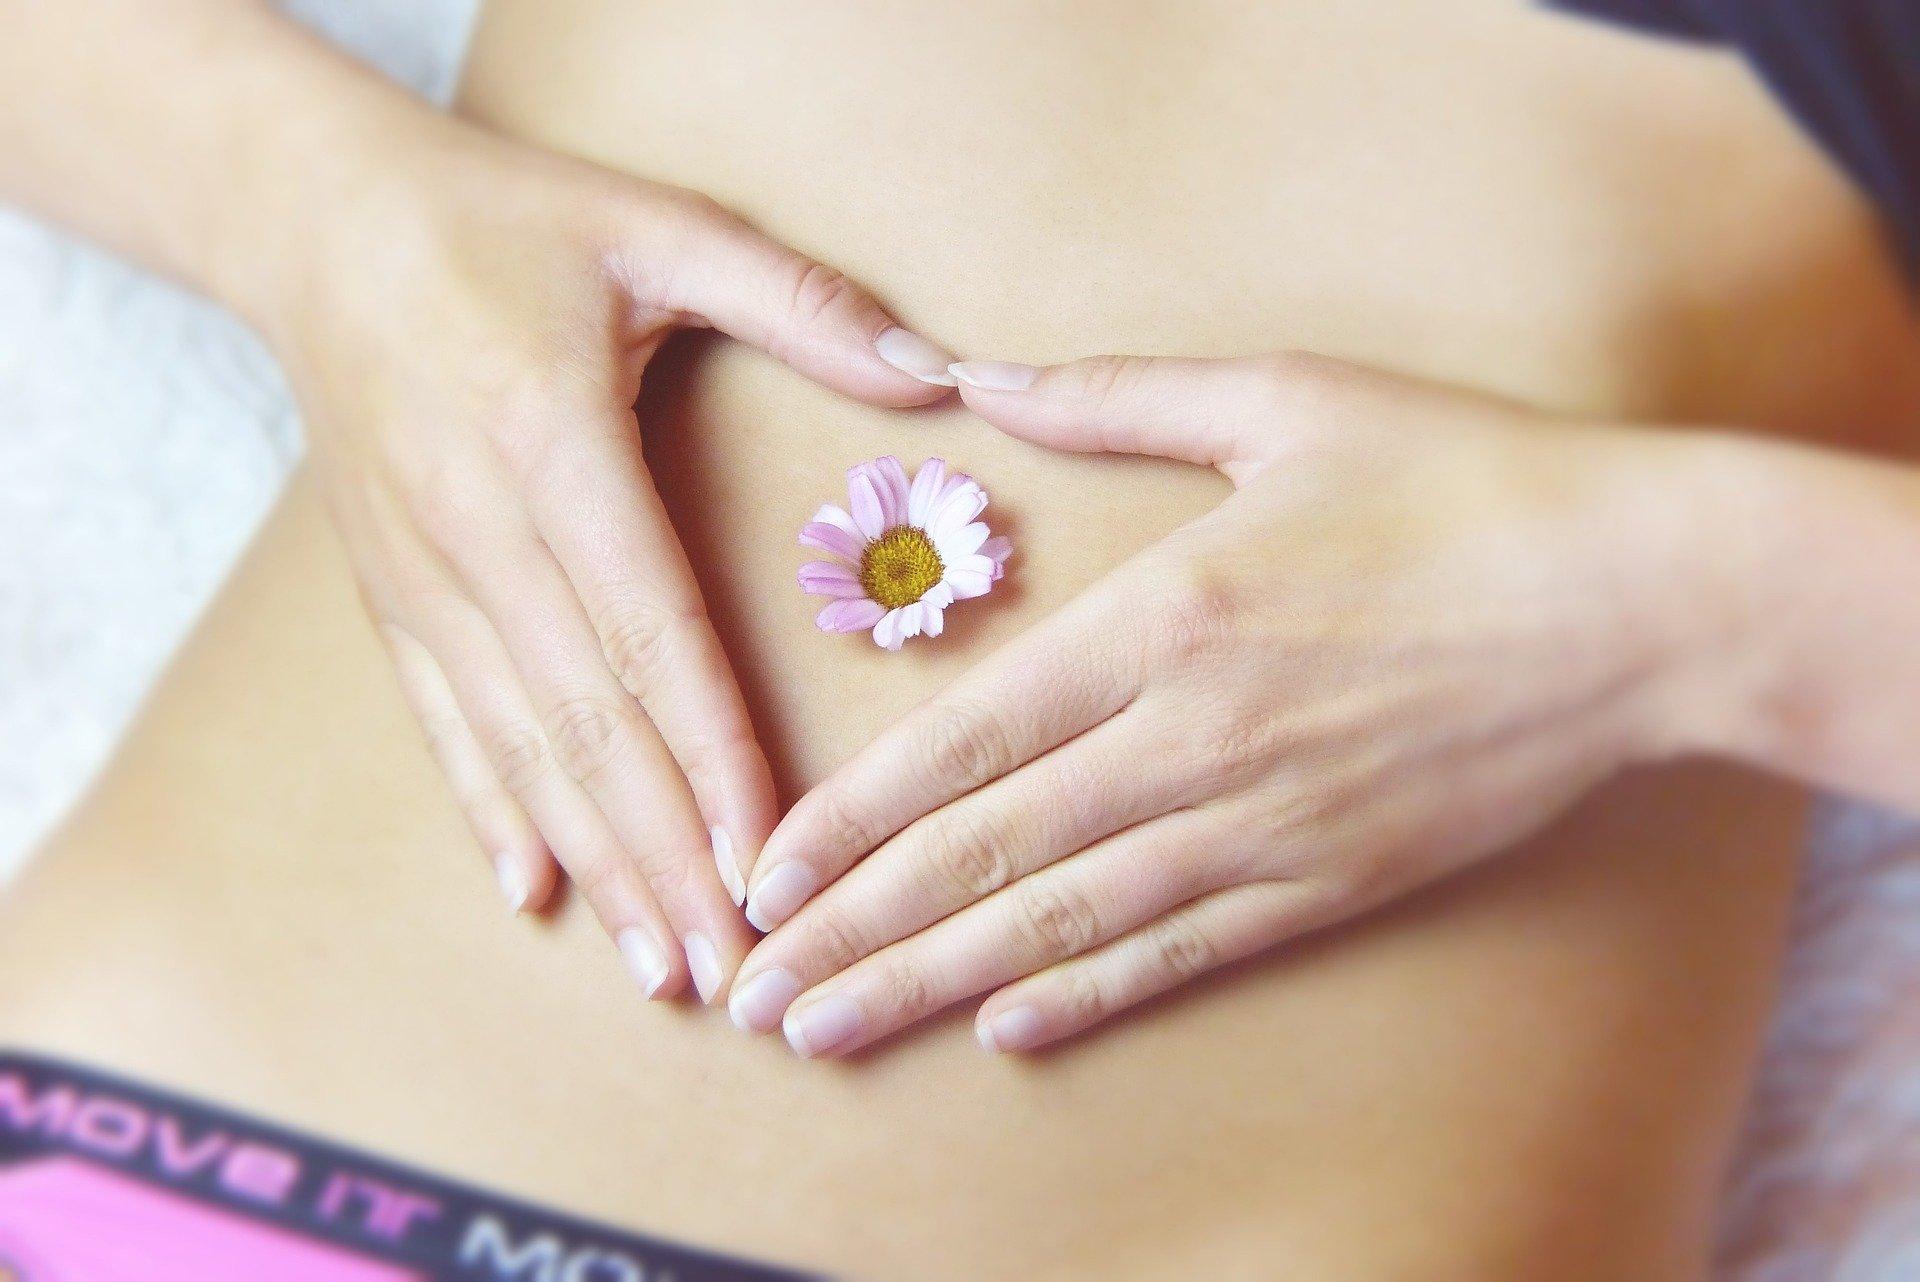 Vientre plano - salud flora intestinal